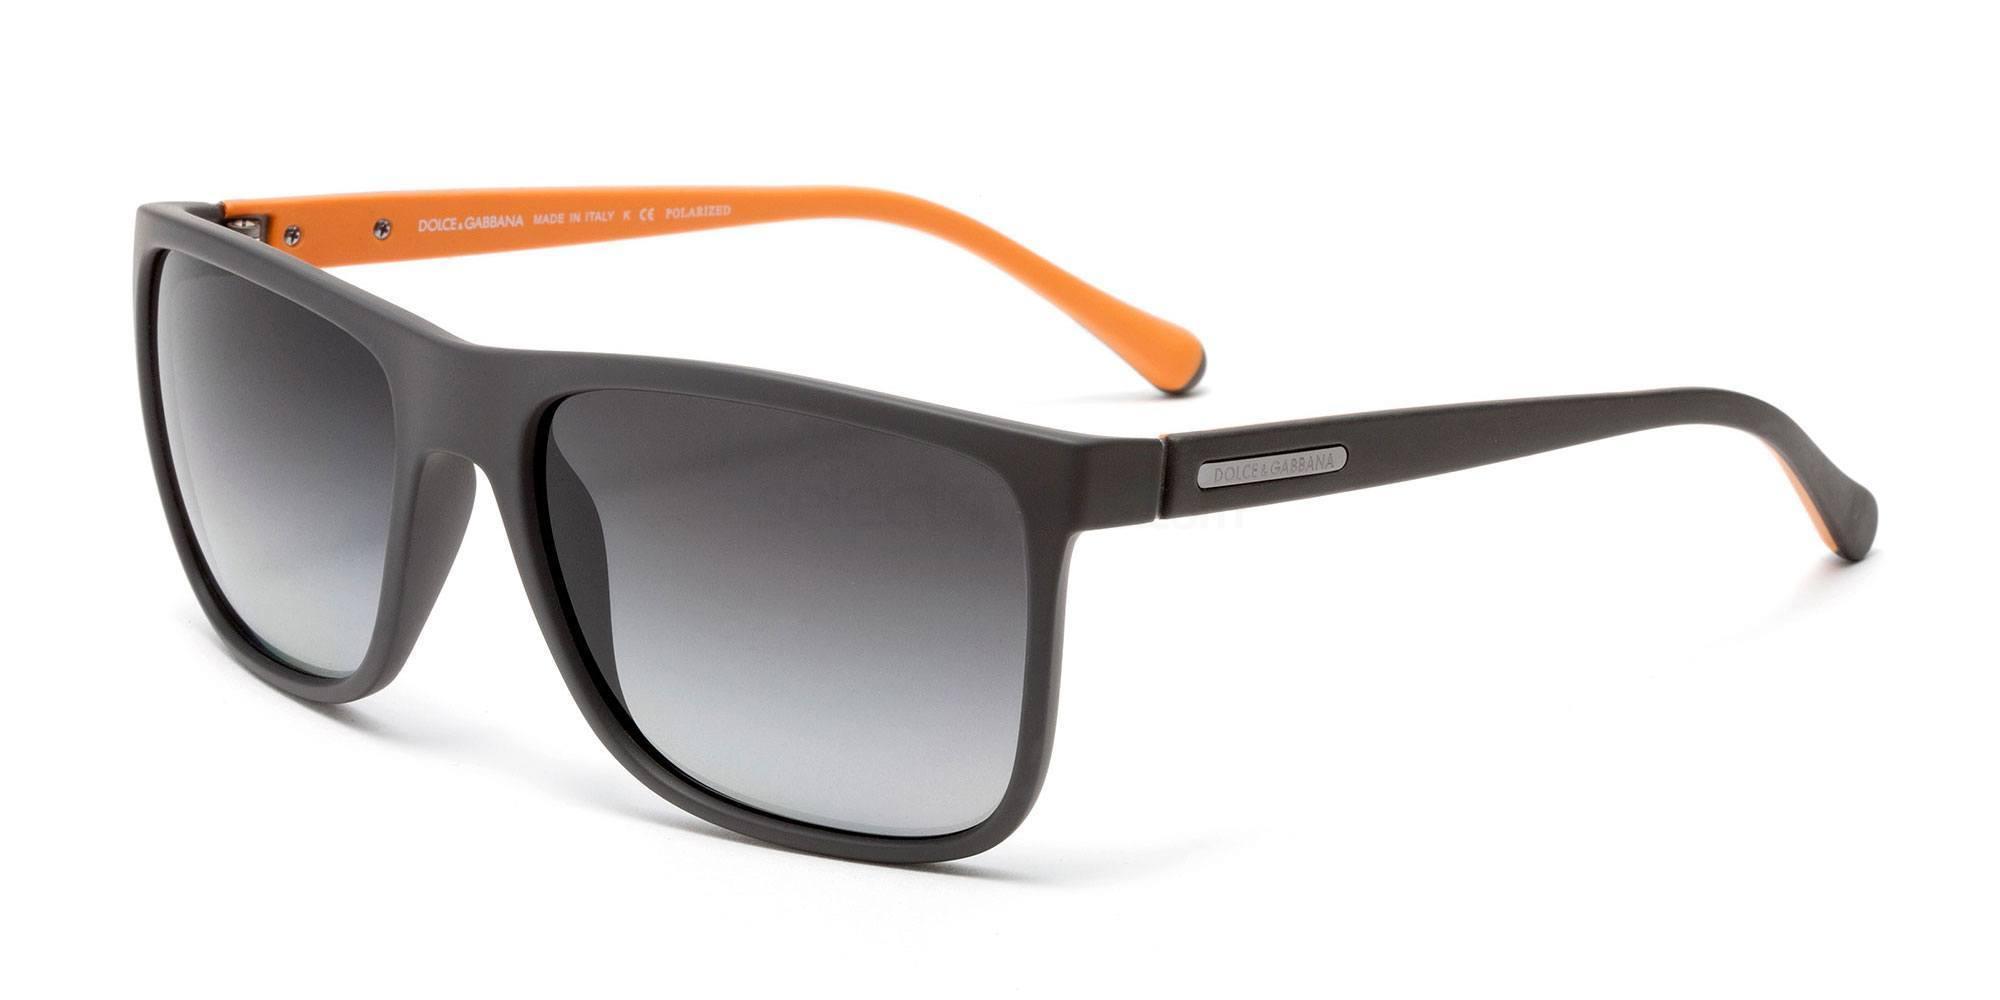 2809T3 DG6086 OVER-MOLDED RUBEBR Sunglasses, Dolce & Gabbana